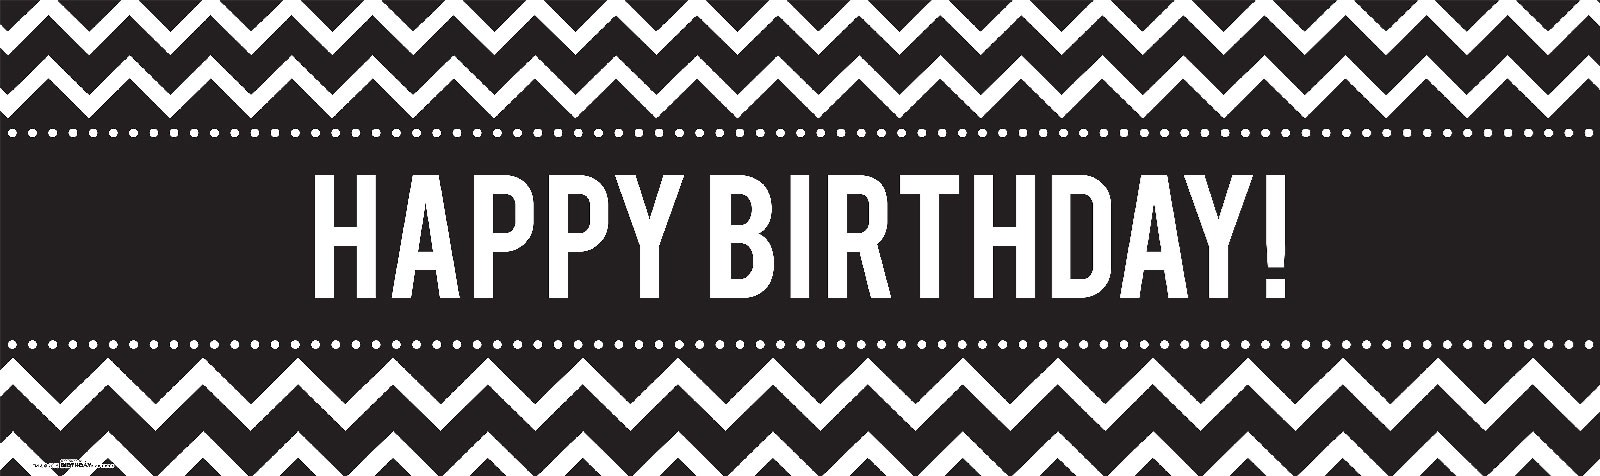 Chevron Black Birthday Banner | BirthdayExpress.com